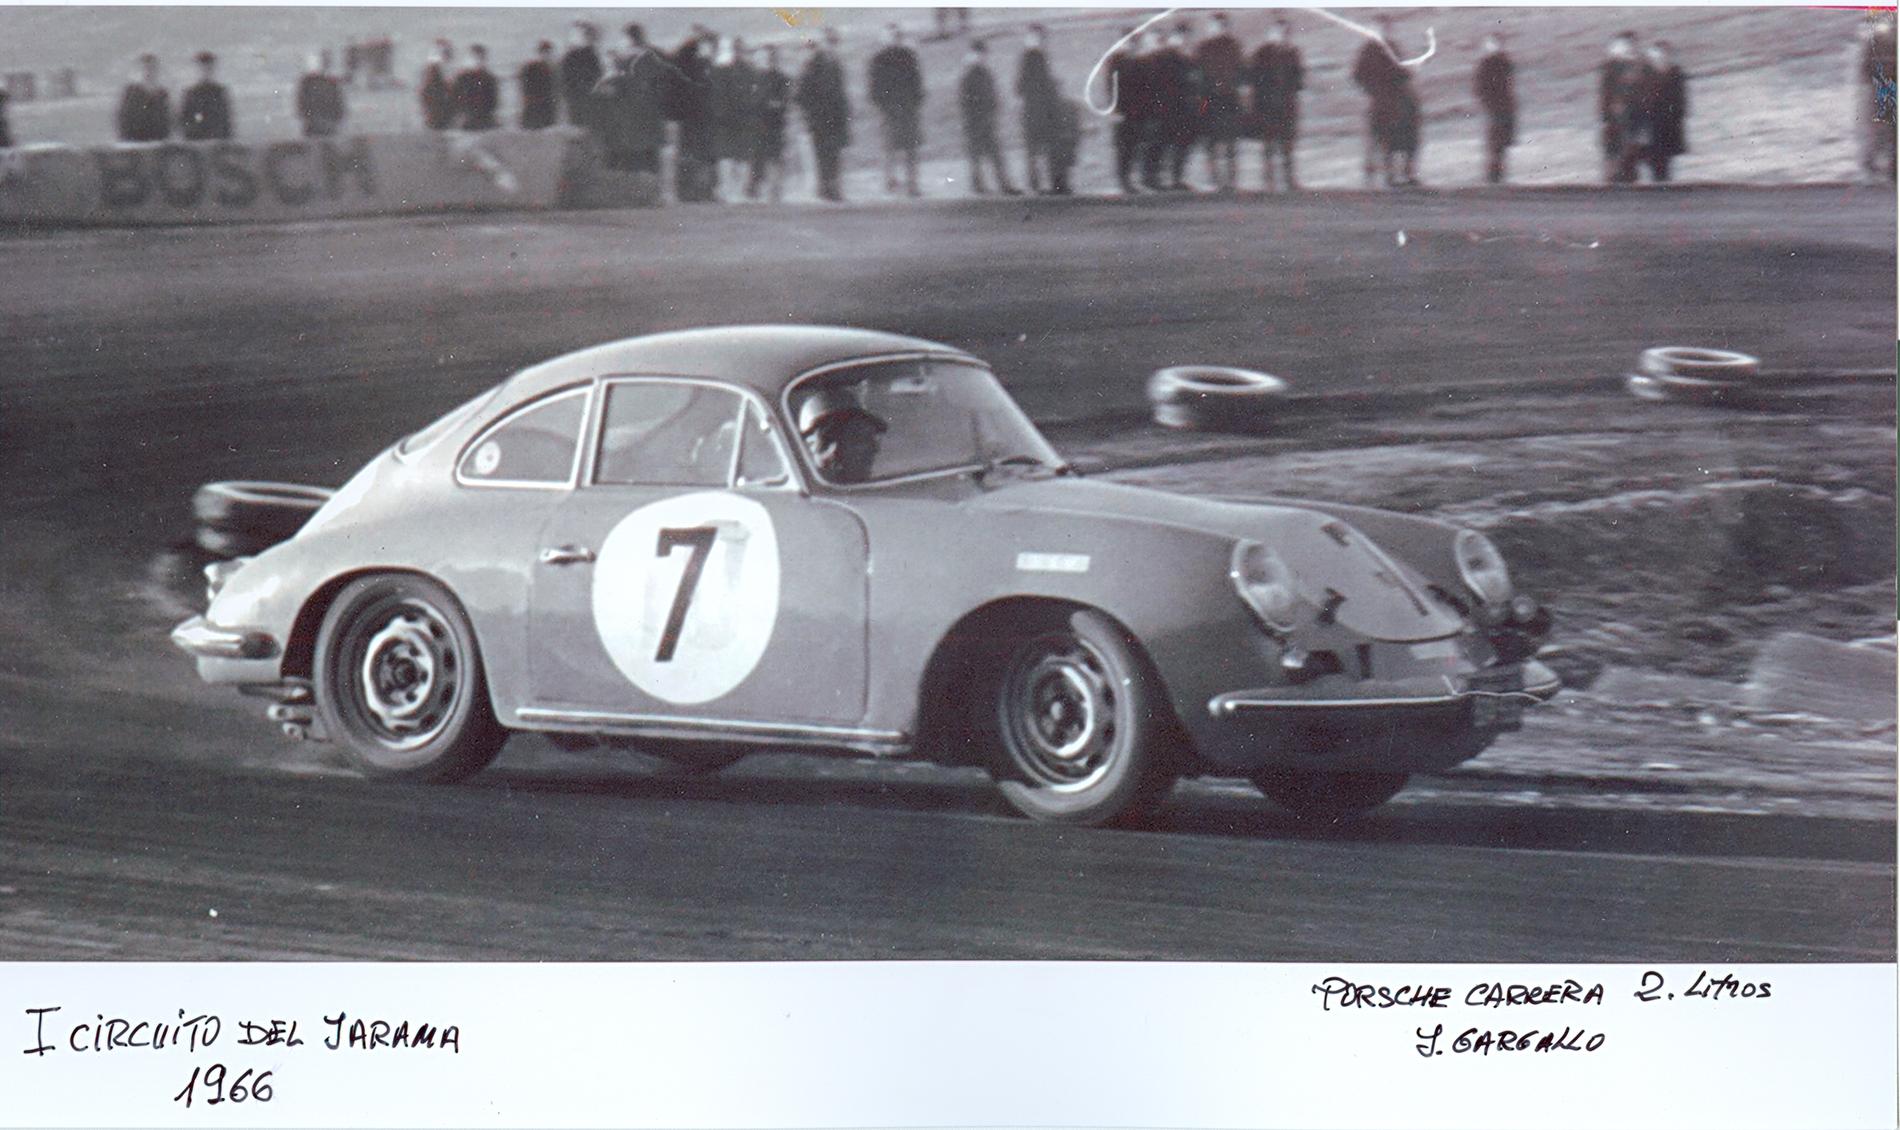 Circuito del Jarama - 1966 - Preinaugural - Gargallo